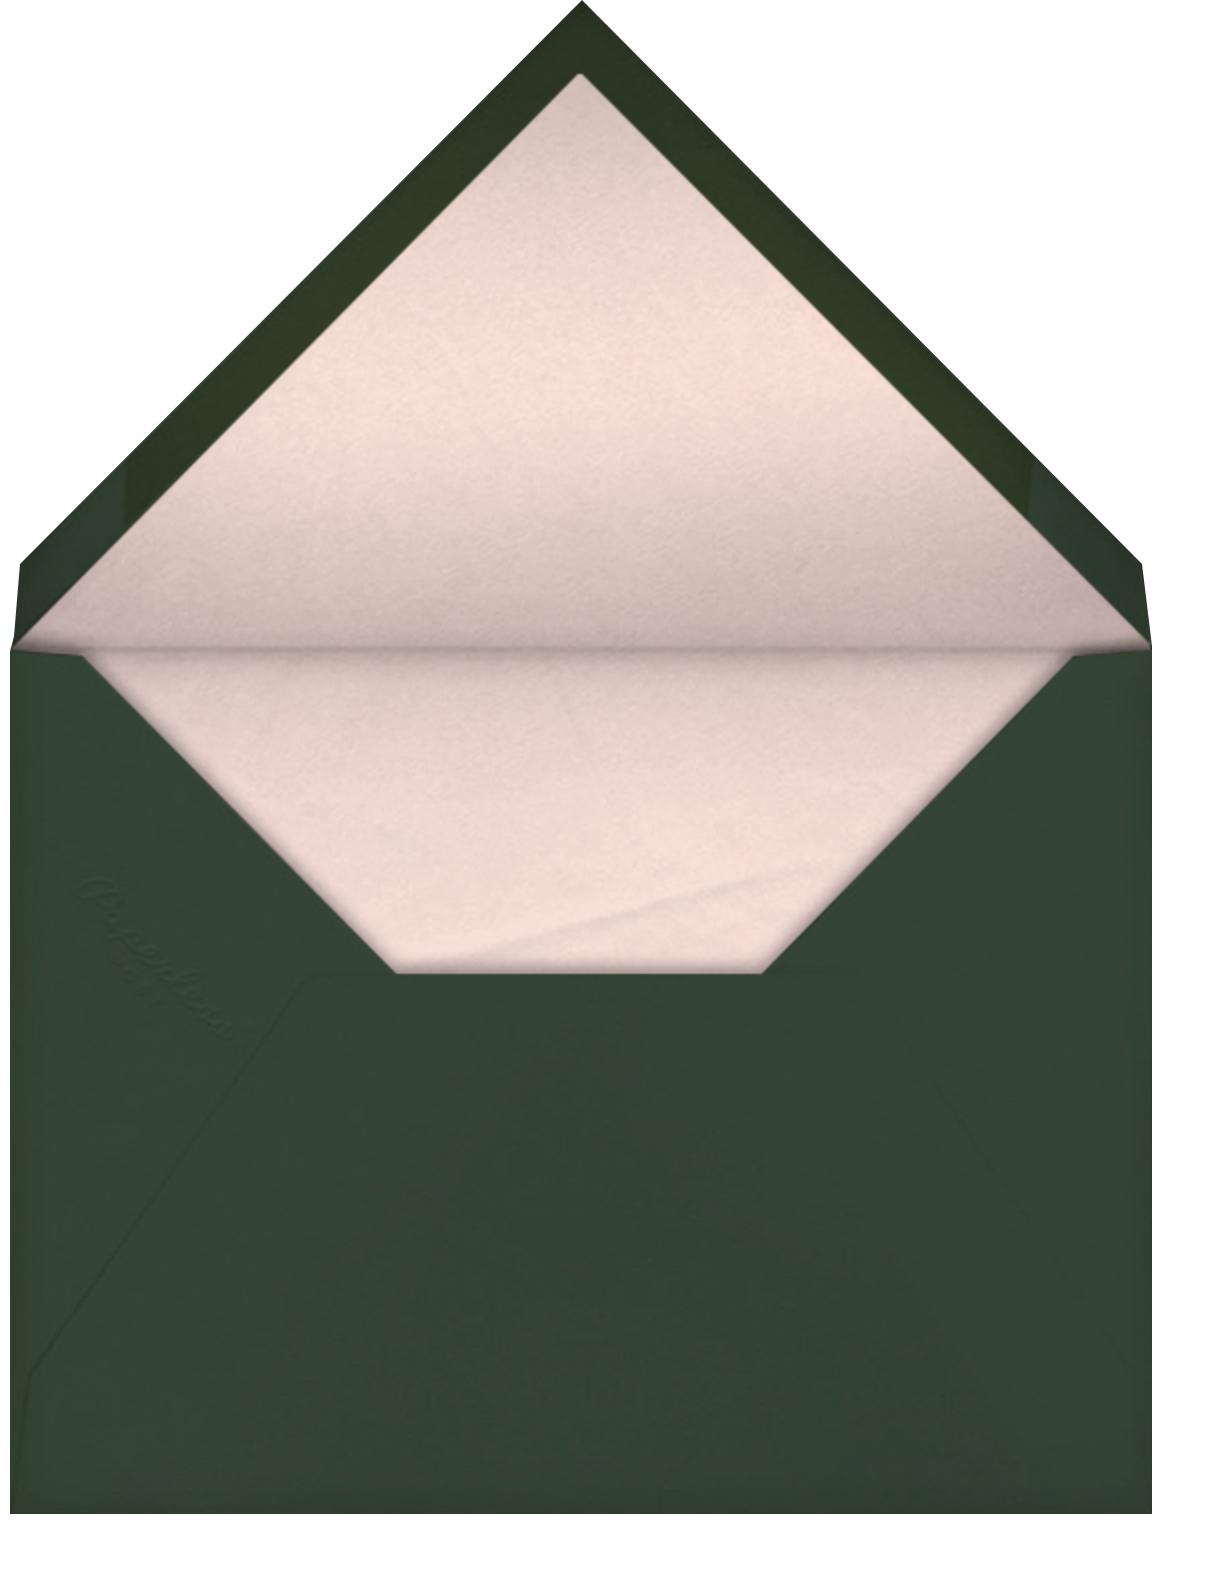 Cortile (Square) - Venamour - Bridal shower - envelope back